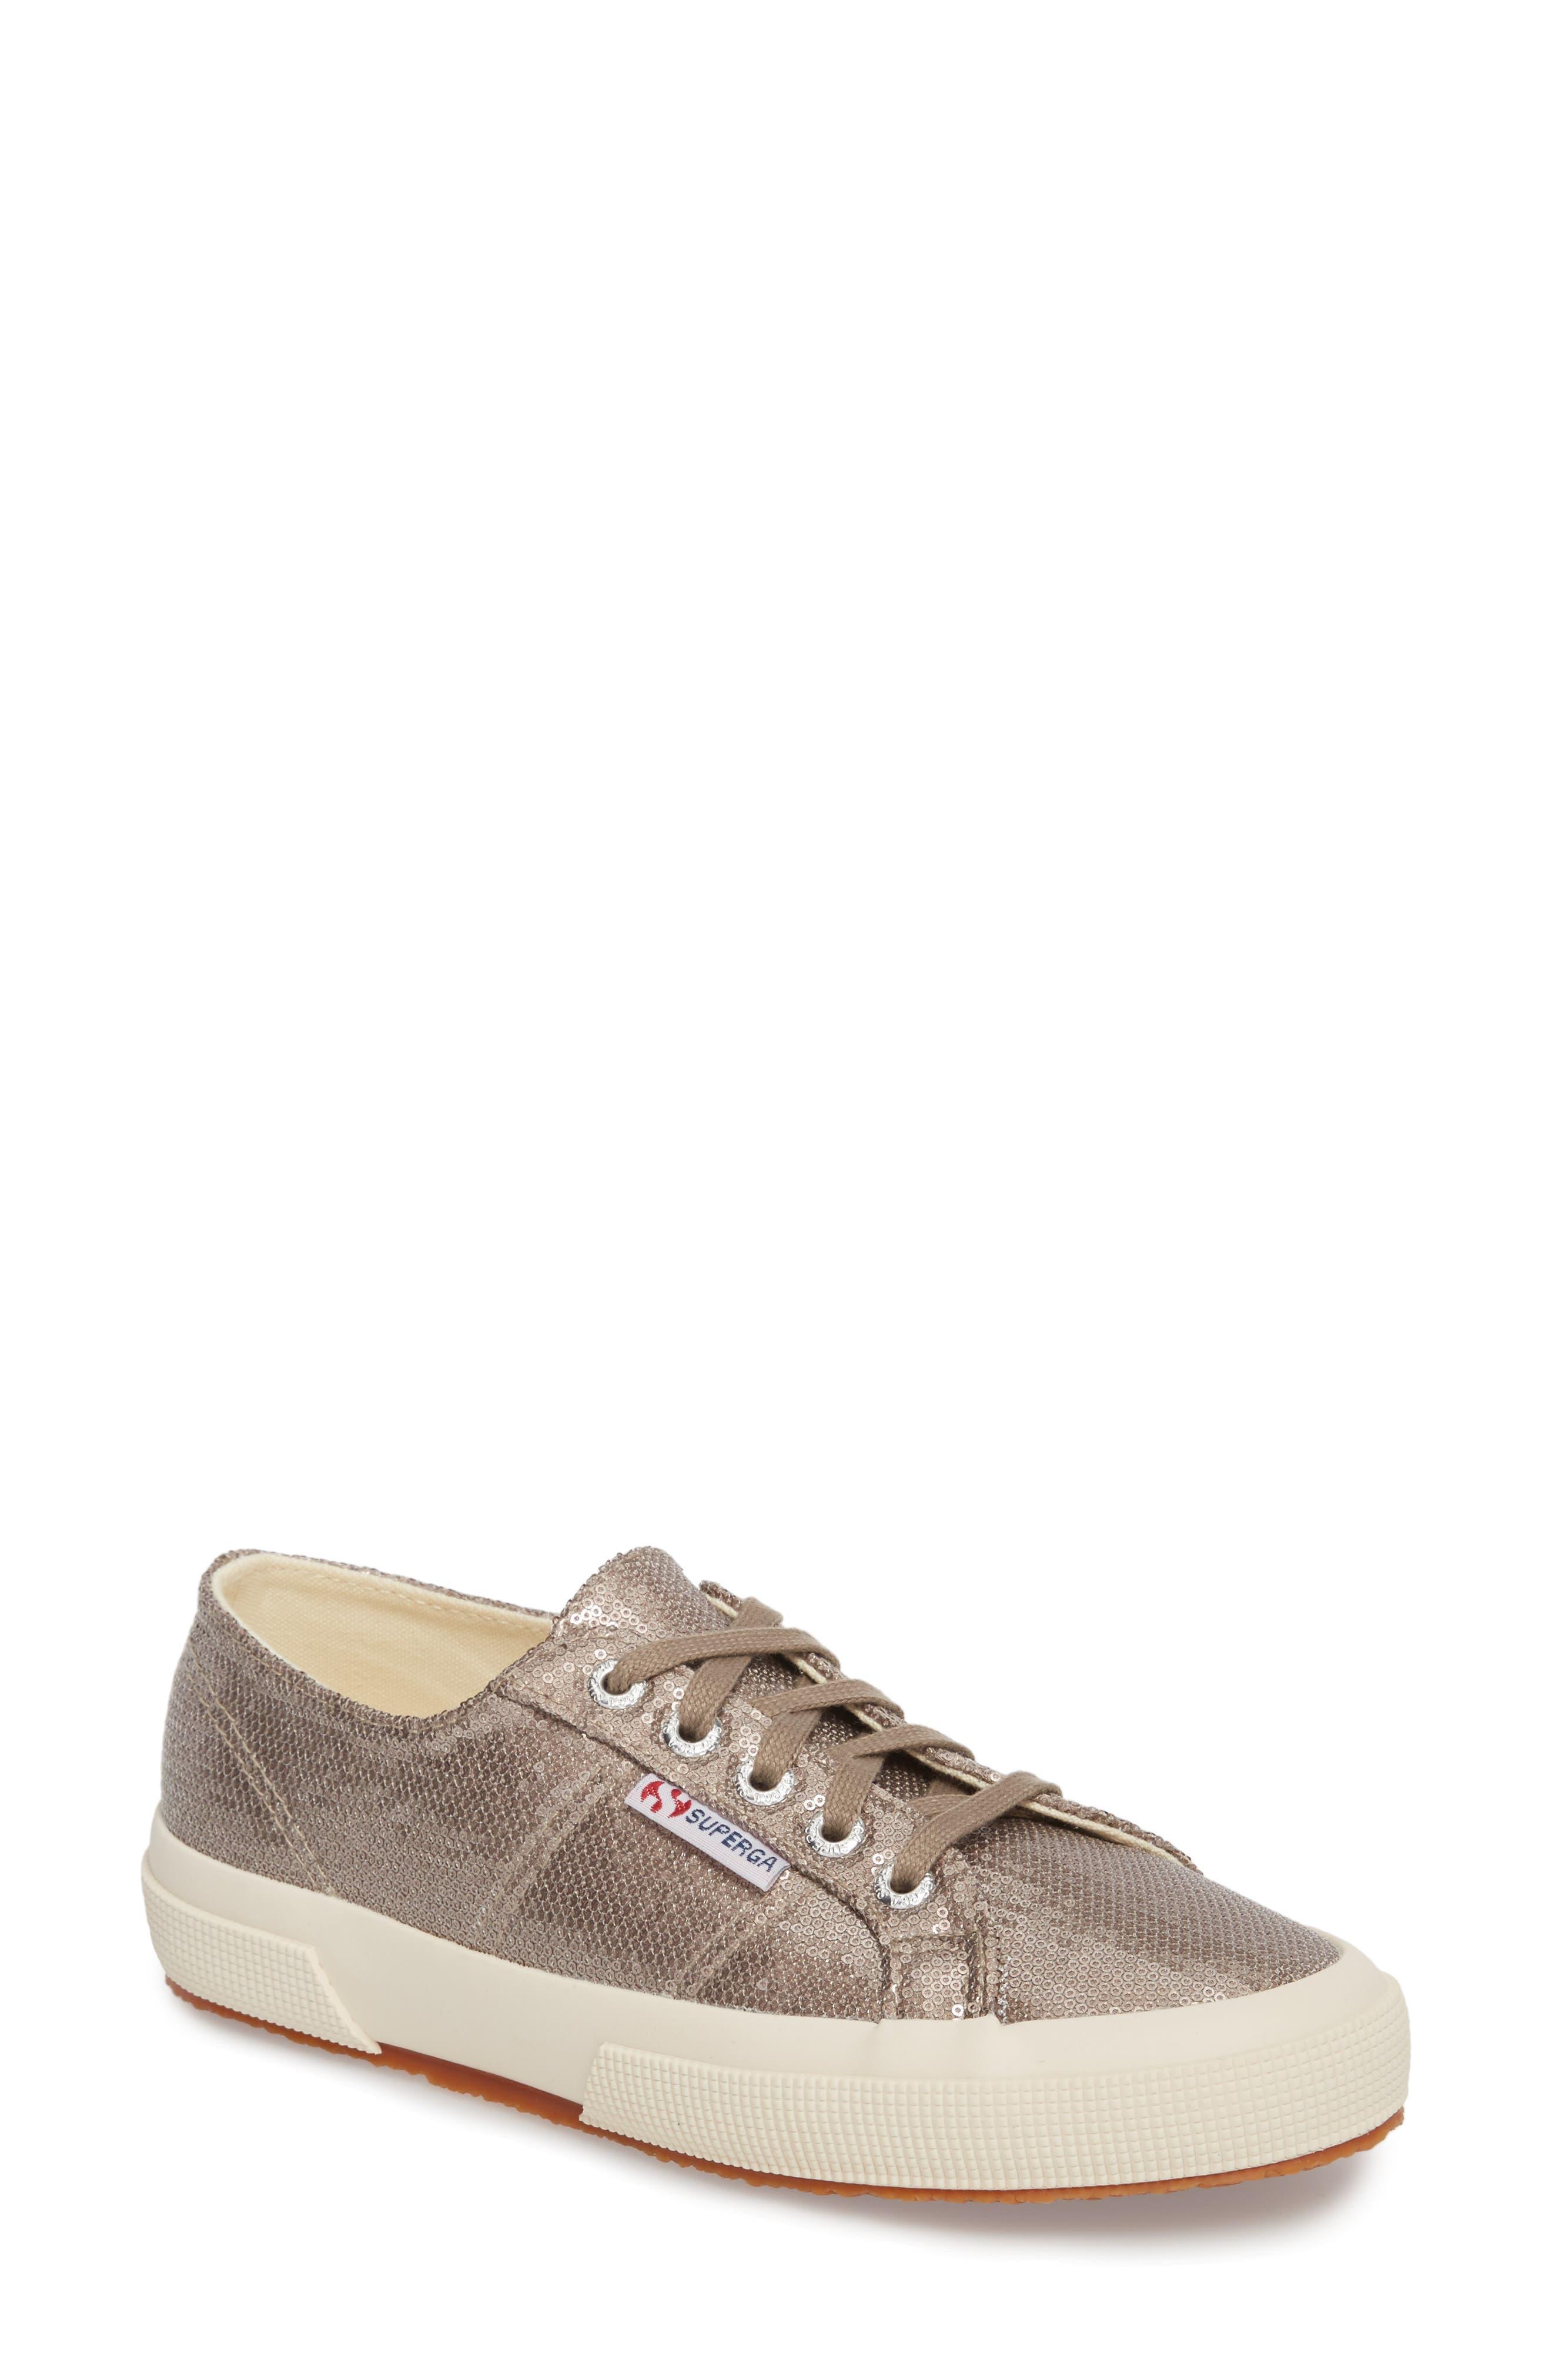 2750 Micro Sequin Sneaker,                             Main thumbnail 1, color,                             Bronze